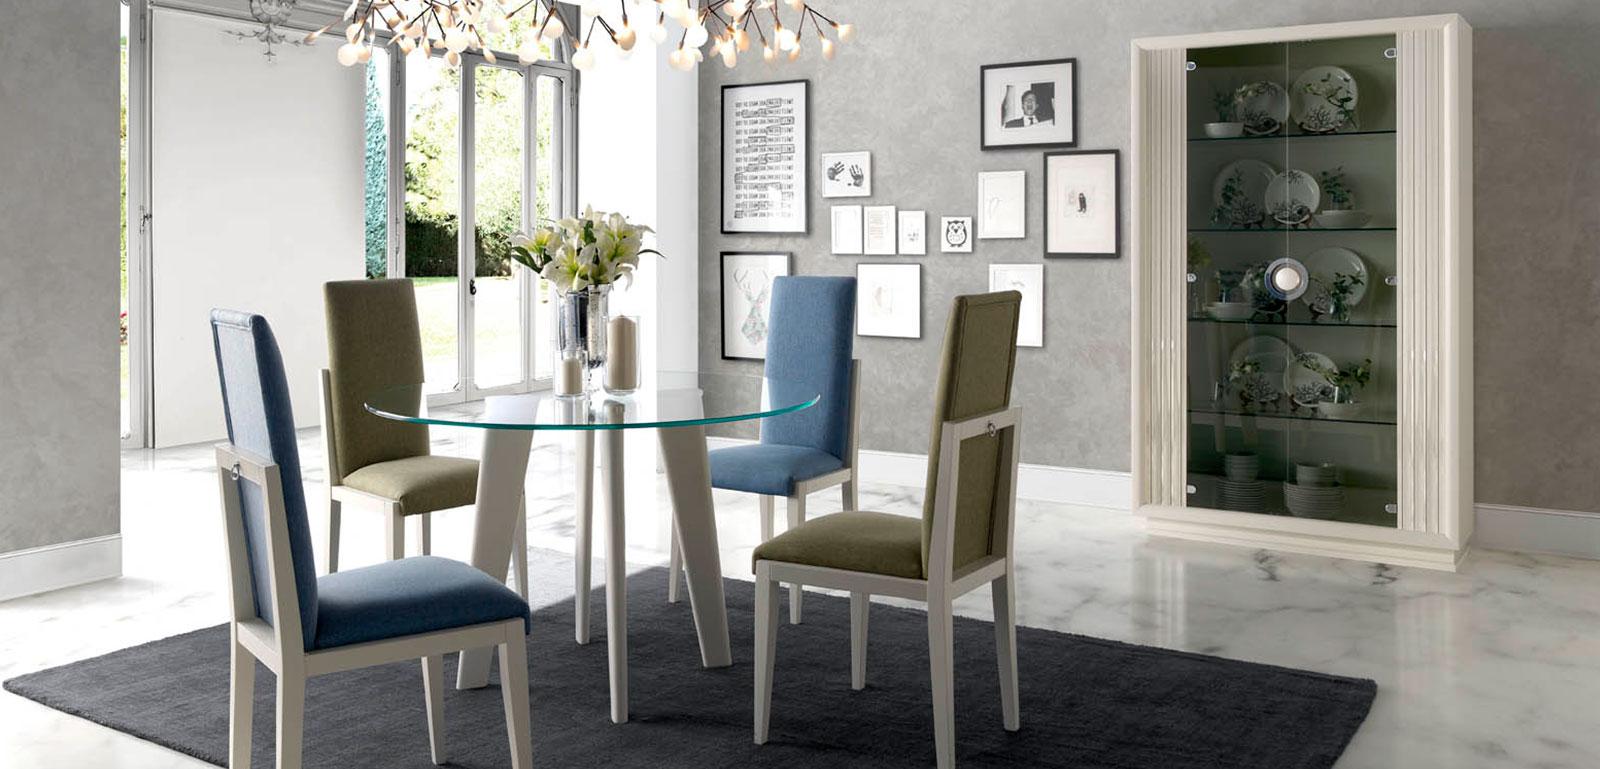 Imgenes De Salones Modernos Simple Salones Modernos Ideas Colores  # Muebles Nebra Salones